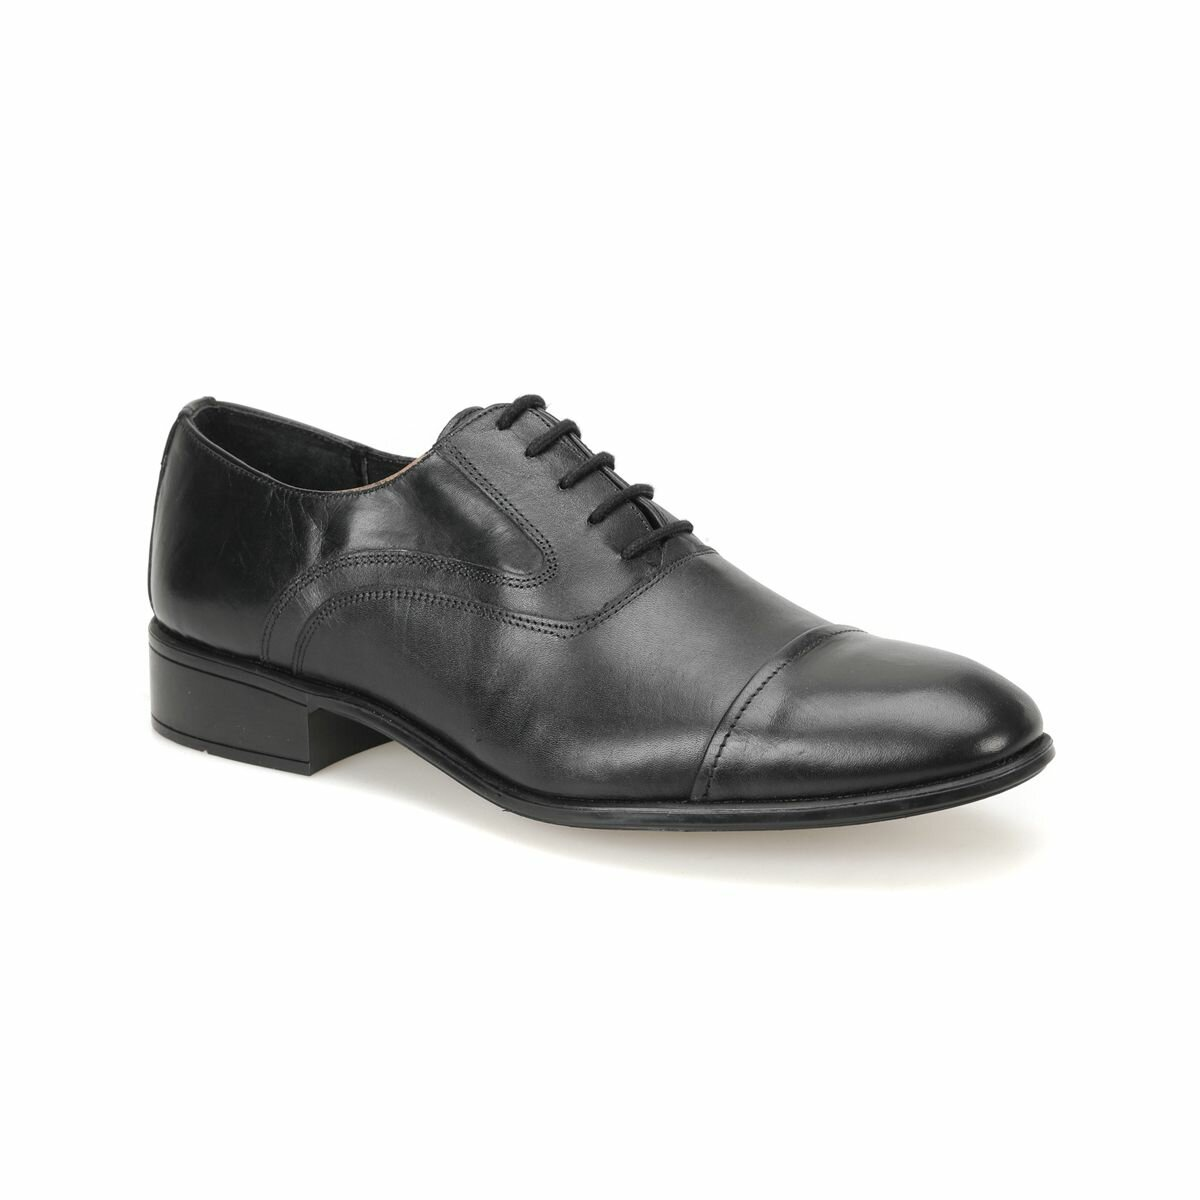 FLO 1018 Black Men 'S Classic Shoes Garamond